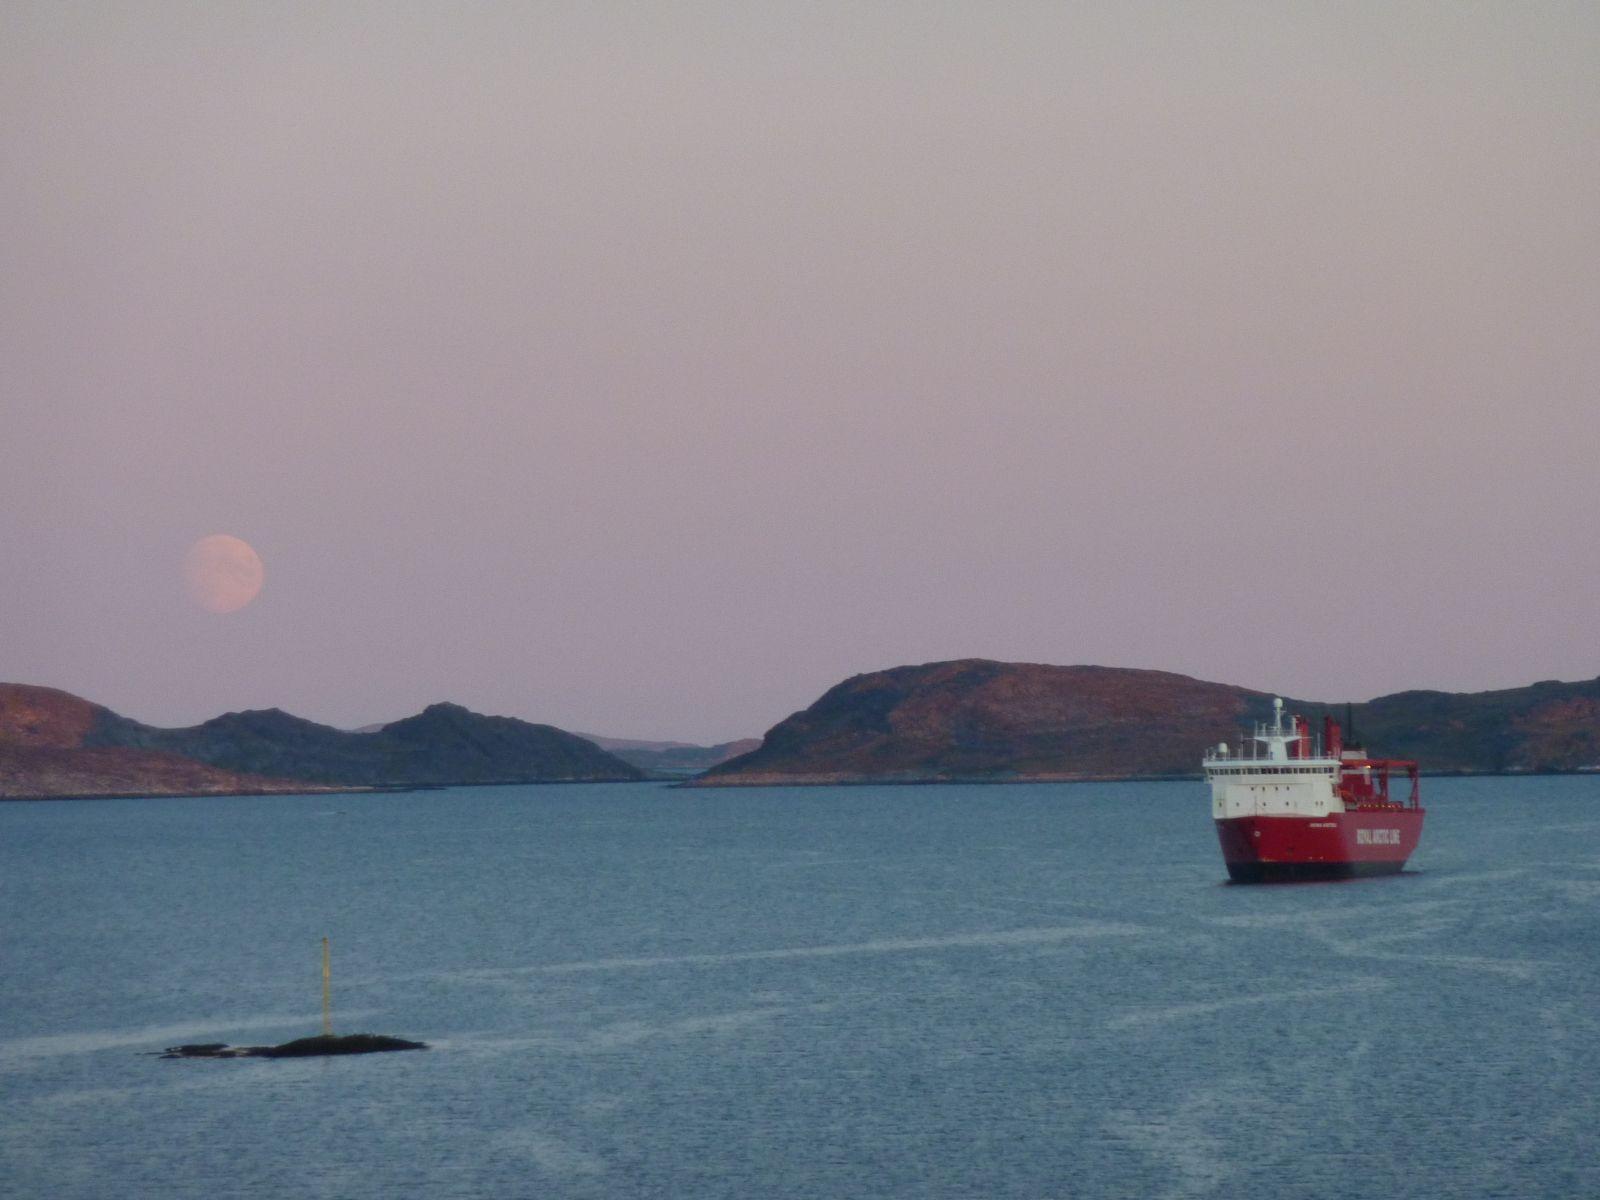 2010-06-23-2343_-_Månen; Ral-skib